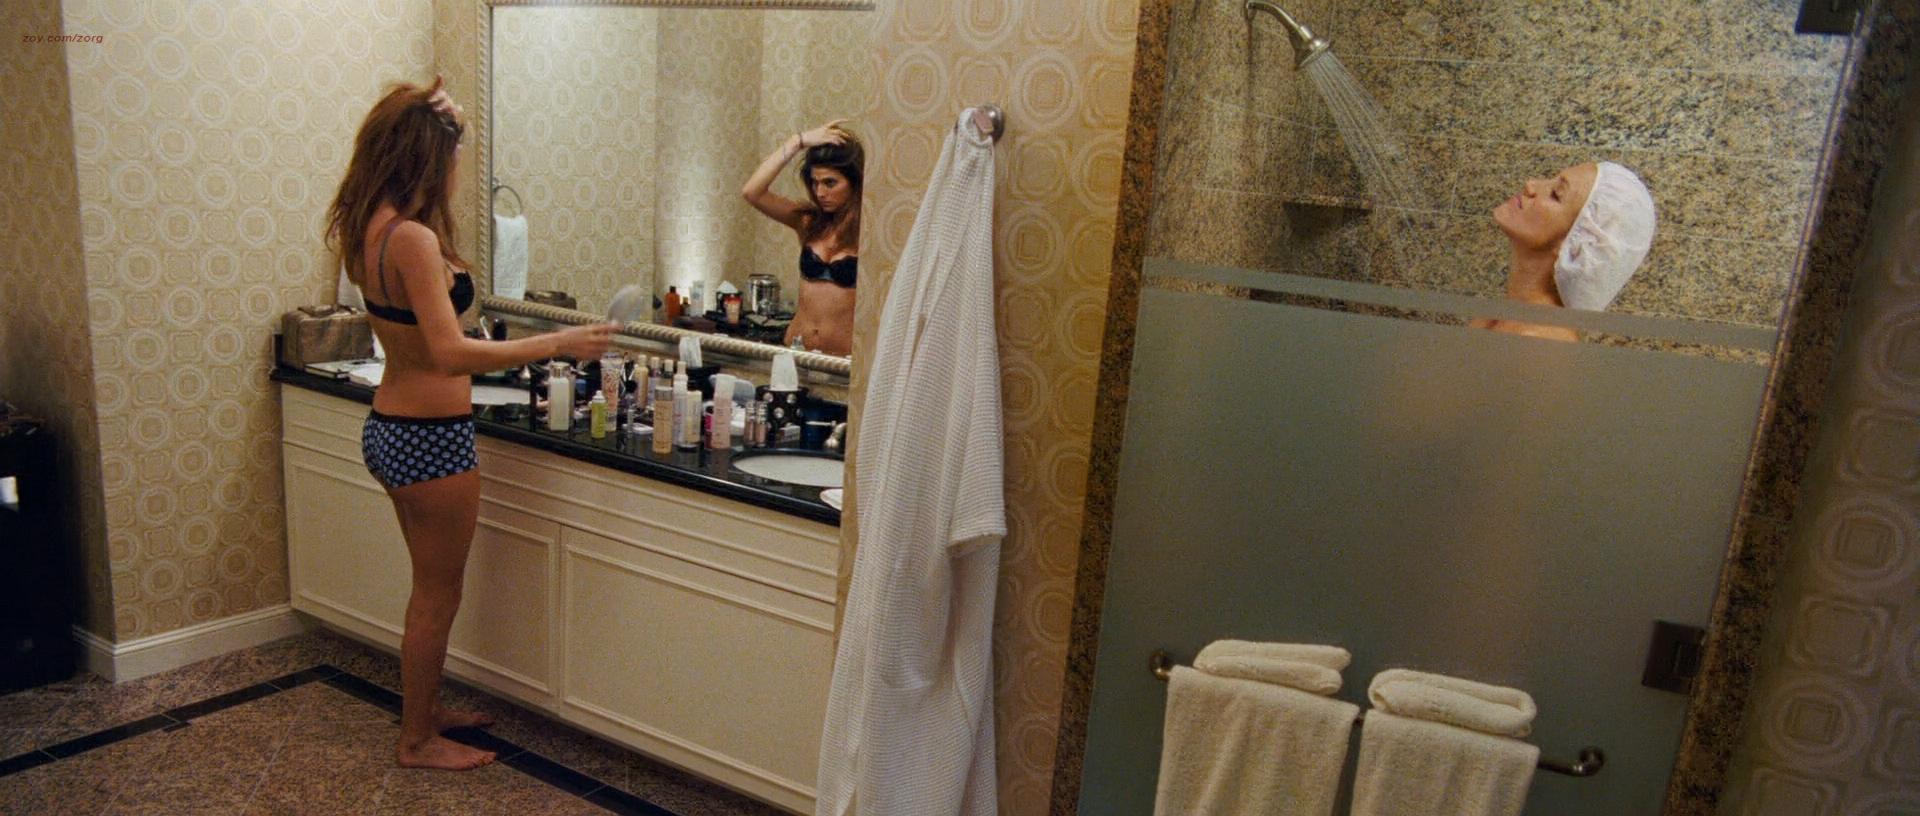 Cameron Diaz hot Krysten Ritter lingerie and Lake Bell hot in undies - What Happens In Vegas (2008) hd1080p (11)